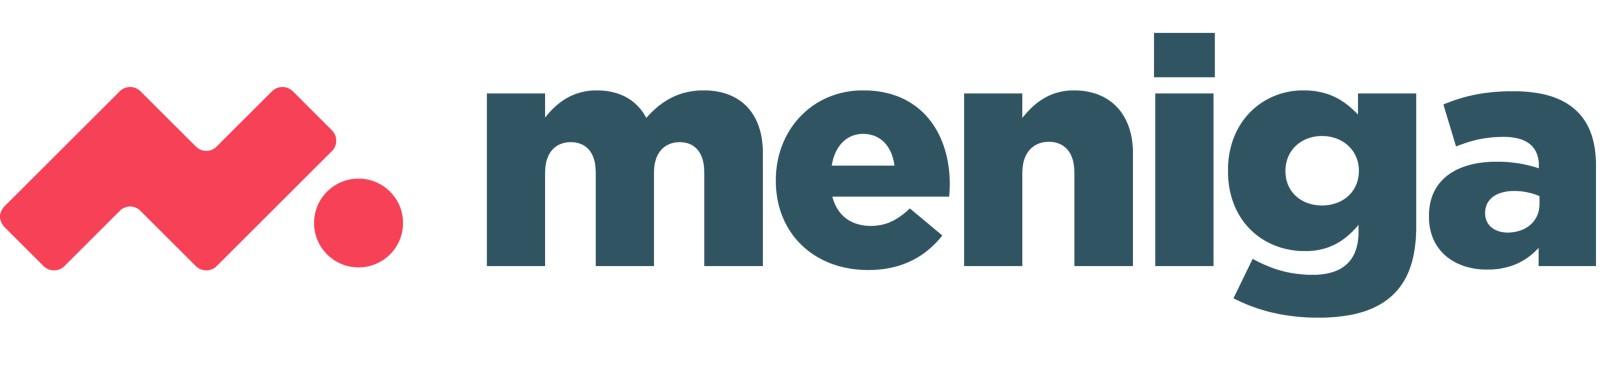 BPER choses Meniga to offer an enriched Digital Banking Solution